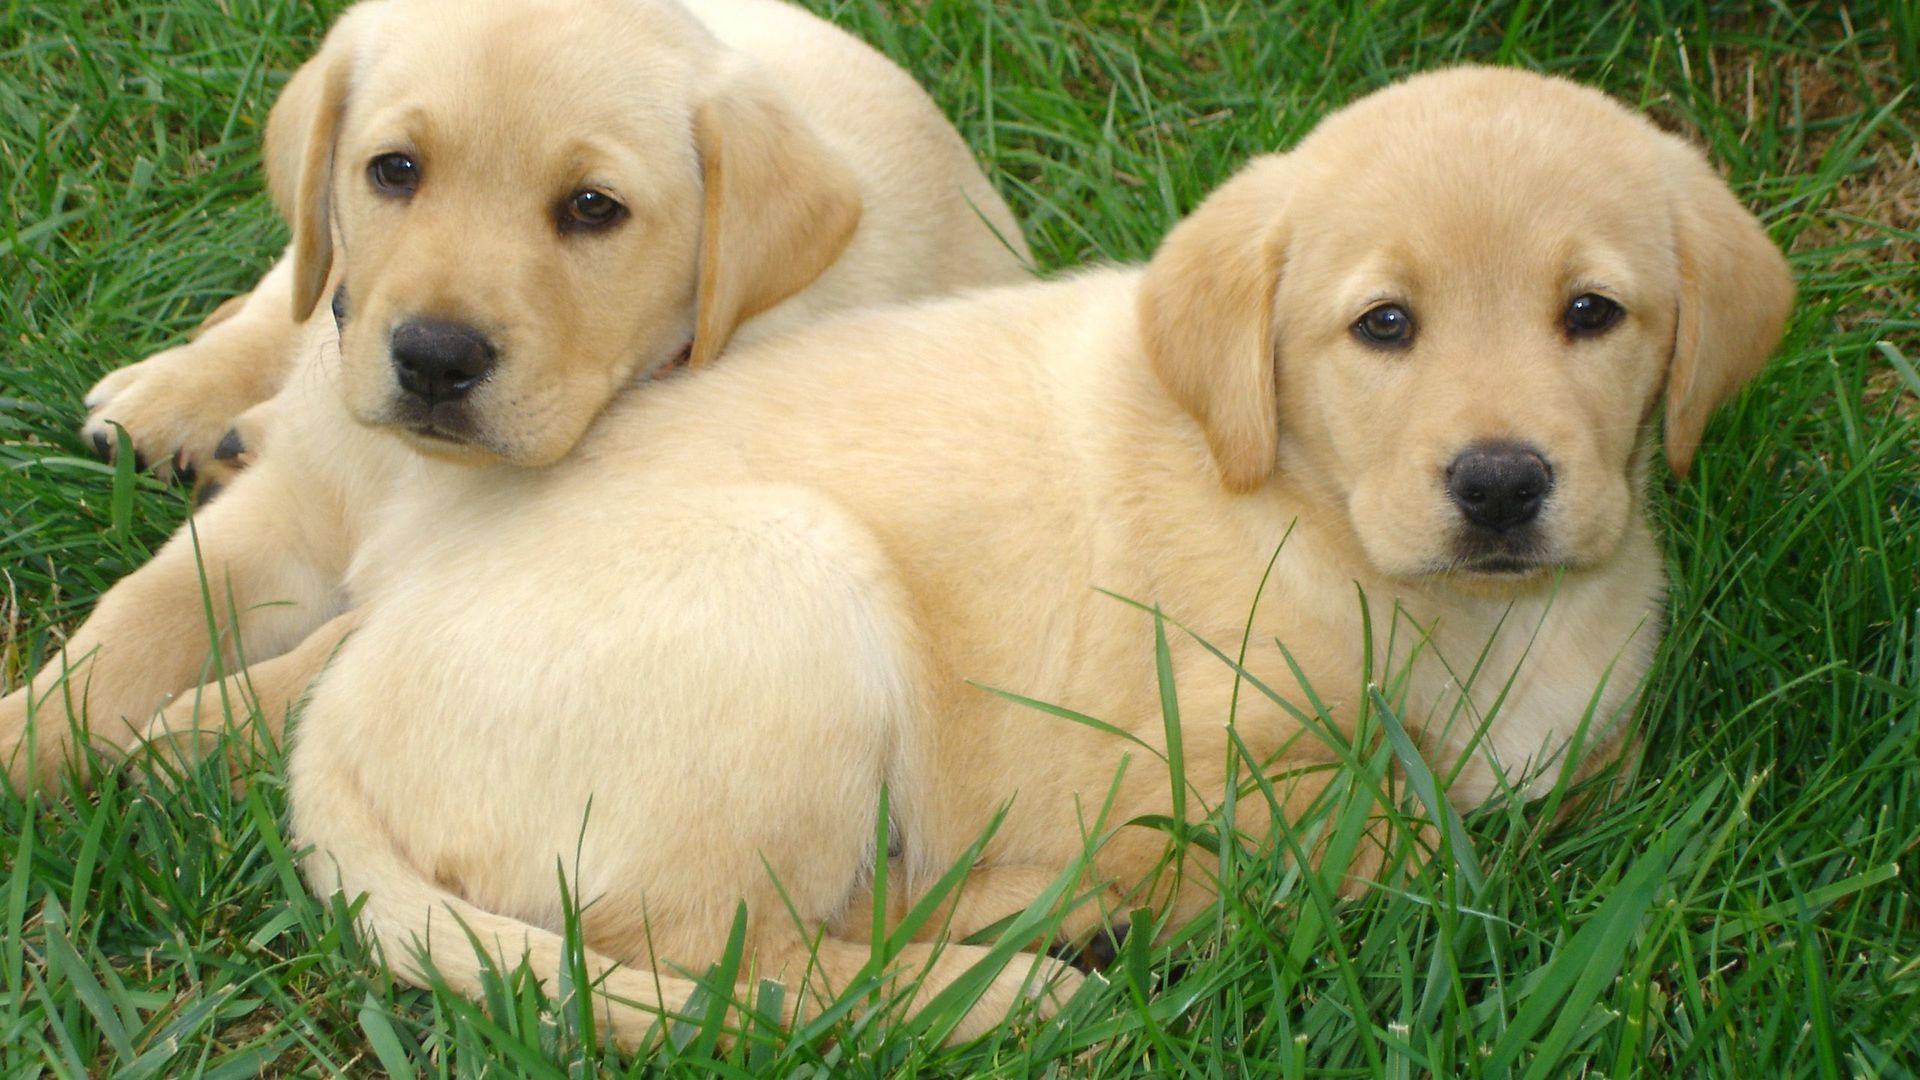 Puppies In Fall Wallpaper Labrador Retriever Puppies Free Hd Wallpapers Hd Wallpaper